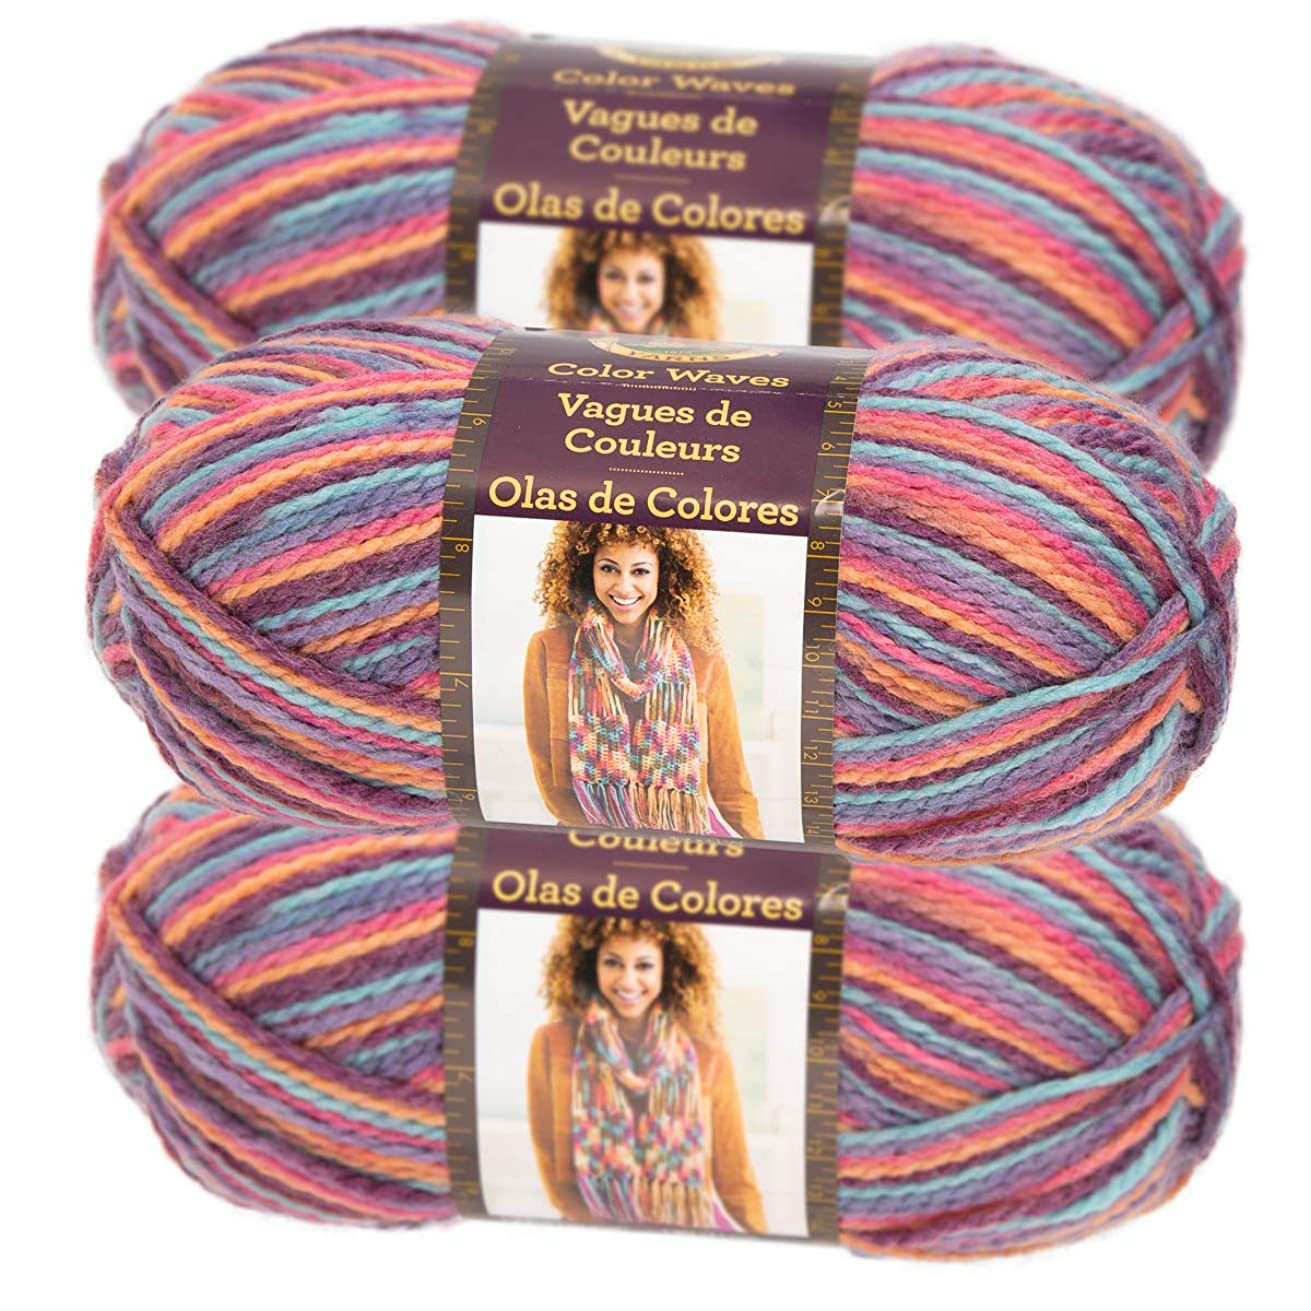 Lion Brand Yarn (3 Pack) Color Waves Acrylic & Wool Yarn Light #3 Soft Yarn for Knitting Crocheting